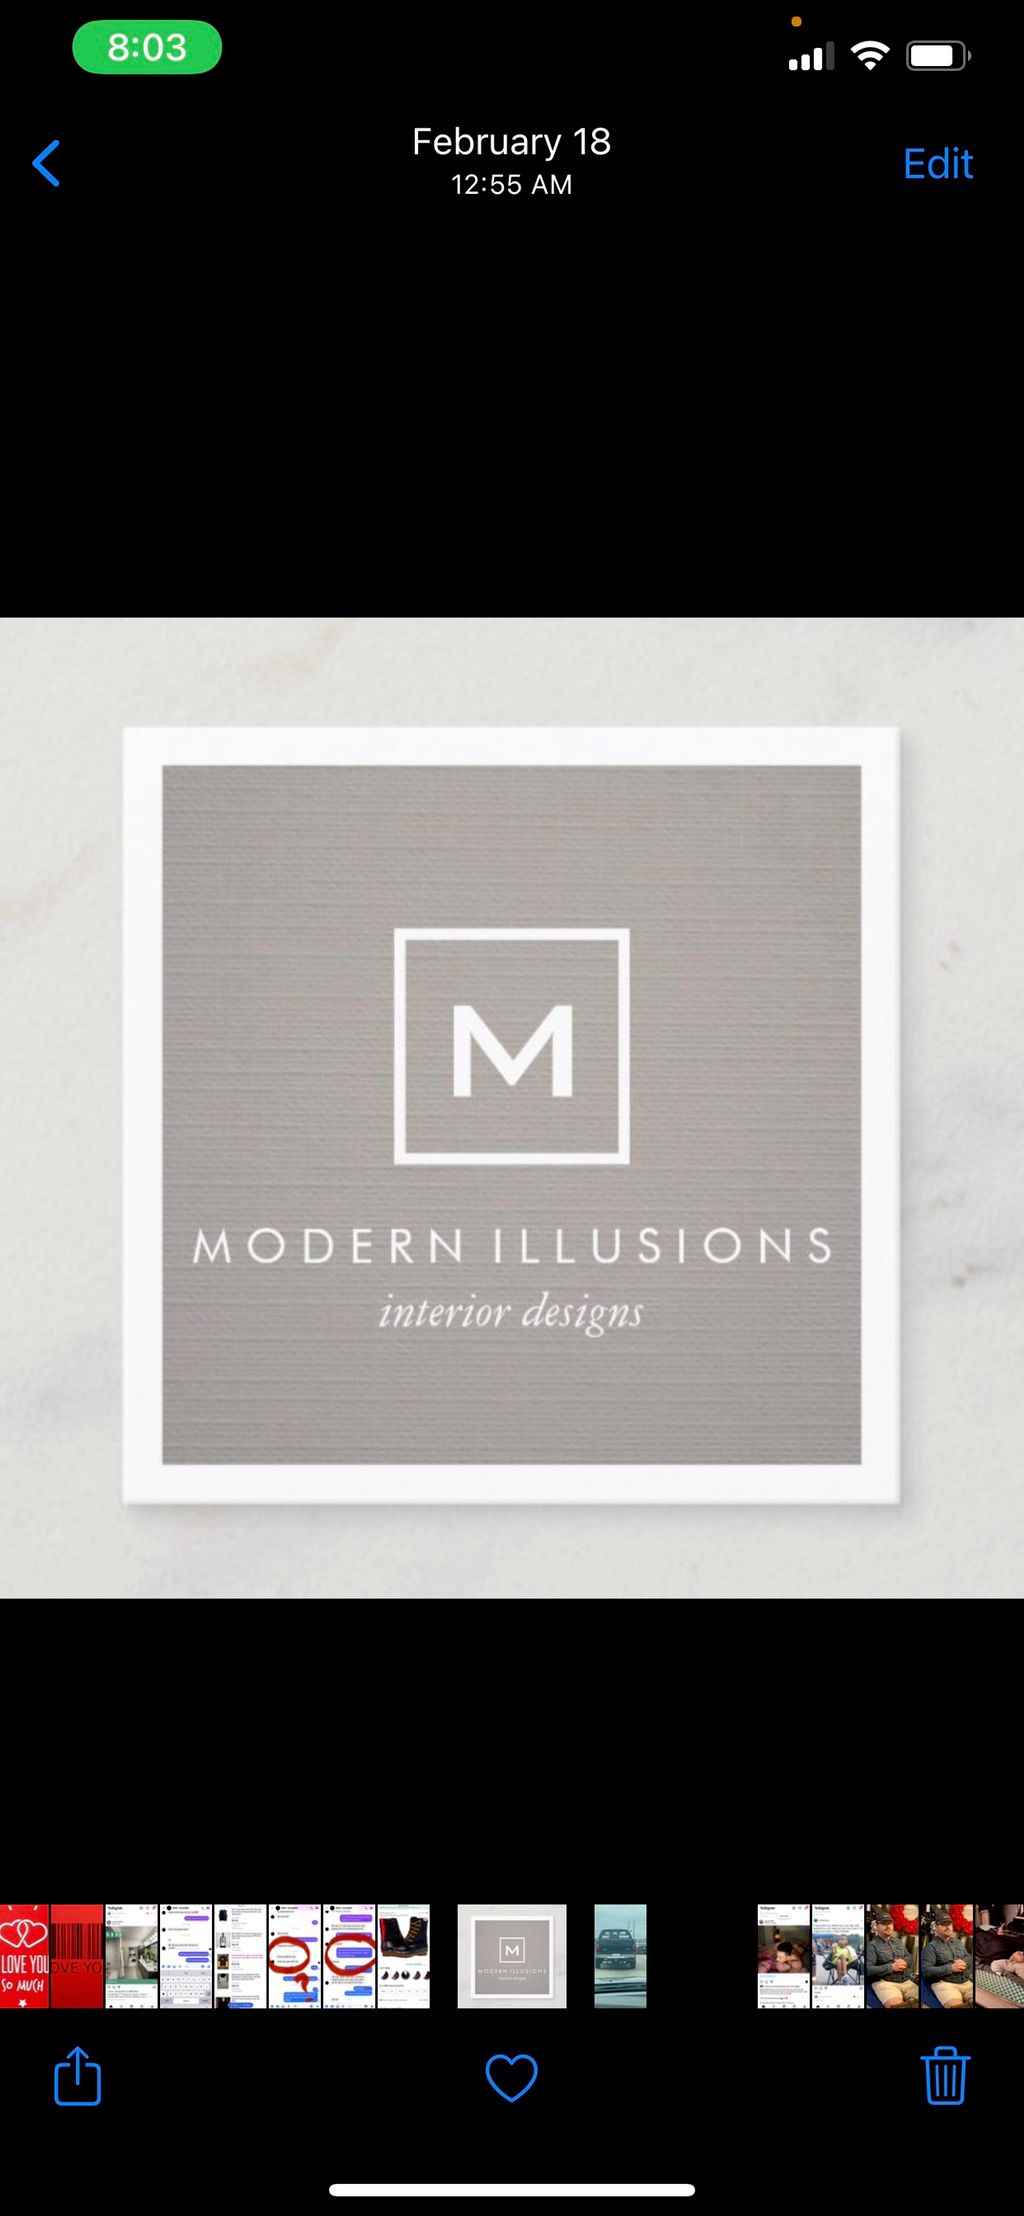 Modern Illusions Interior Design